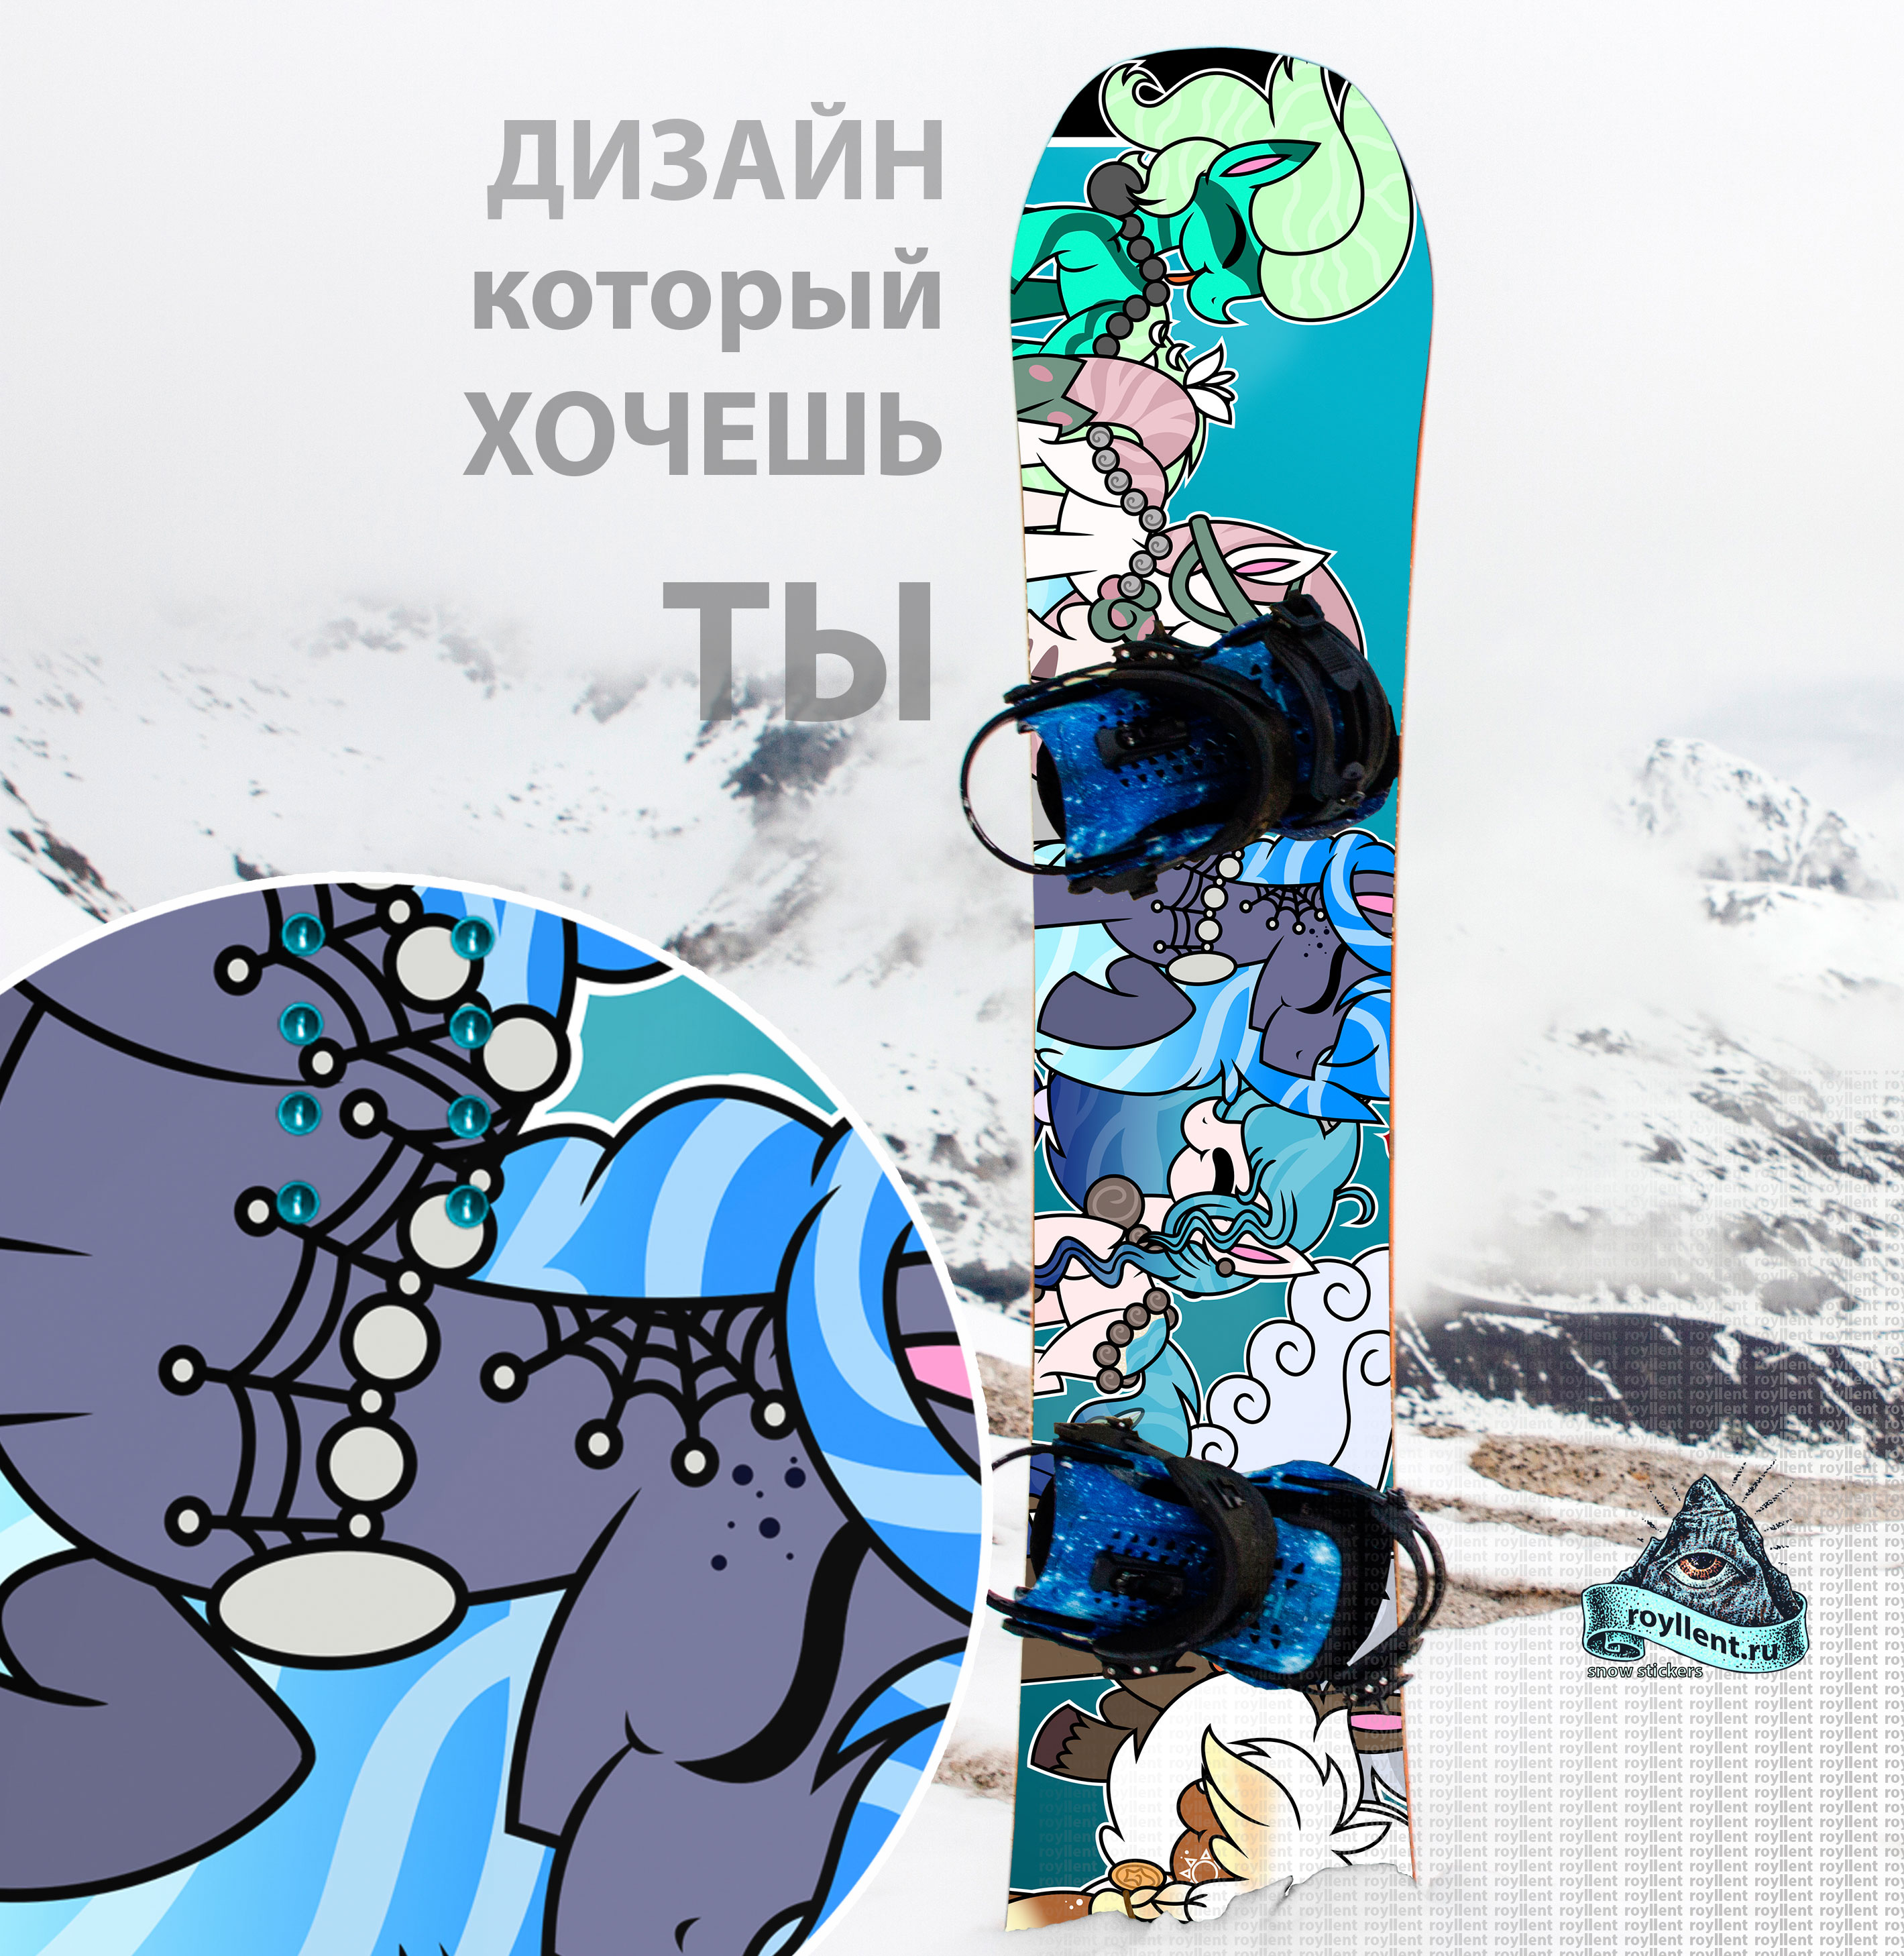 Детская наклейка пони на сноуборд